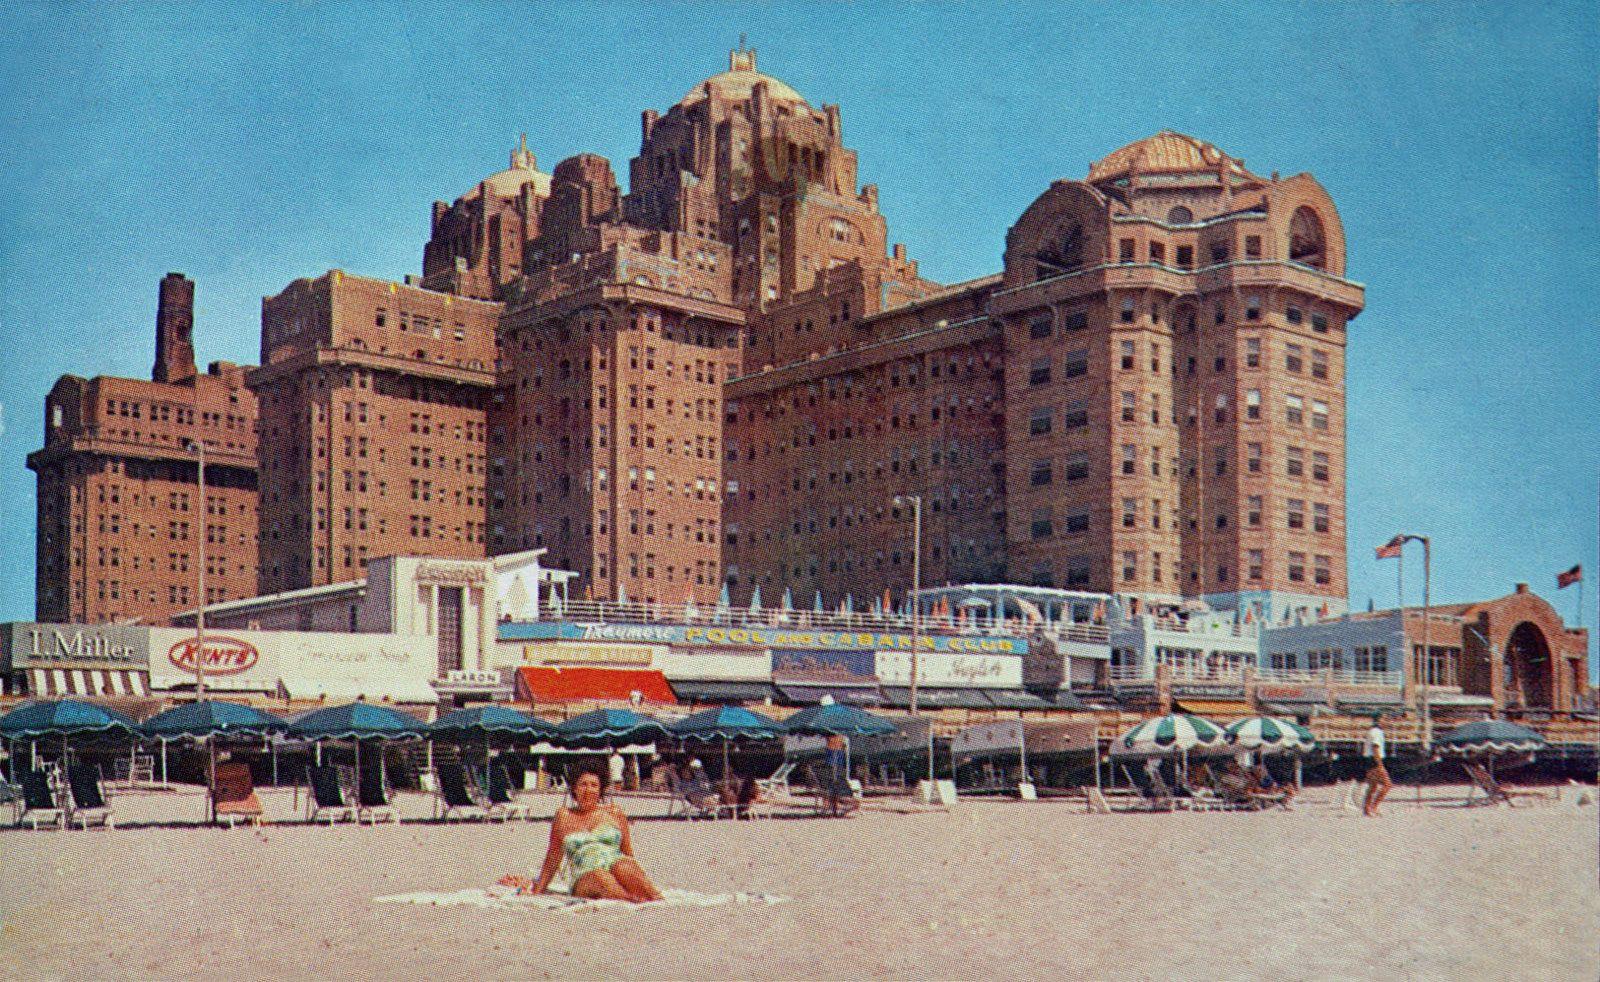 Hotel Traymore Atlantic City New Jersey Atlantic City Atlantic City Hotels Atlantic City Boardwalk